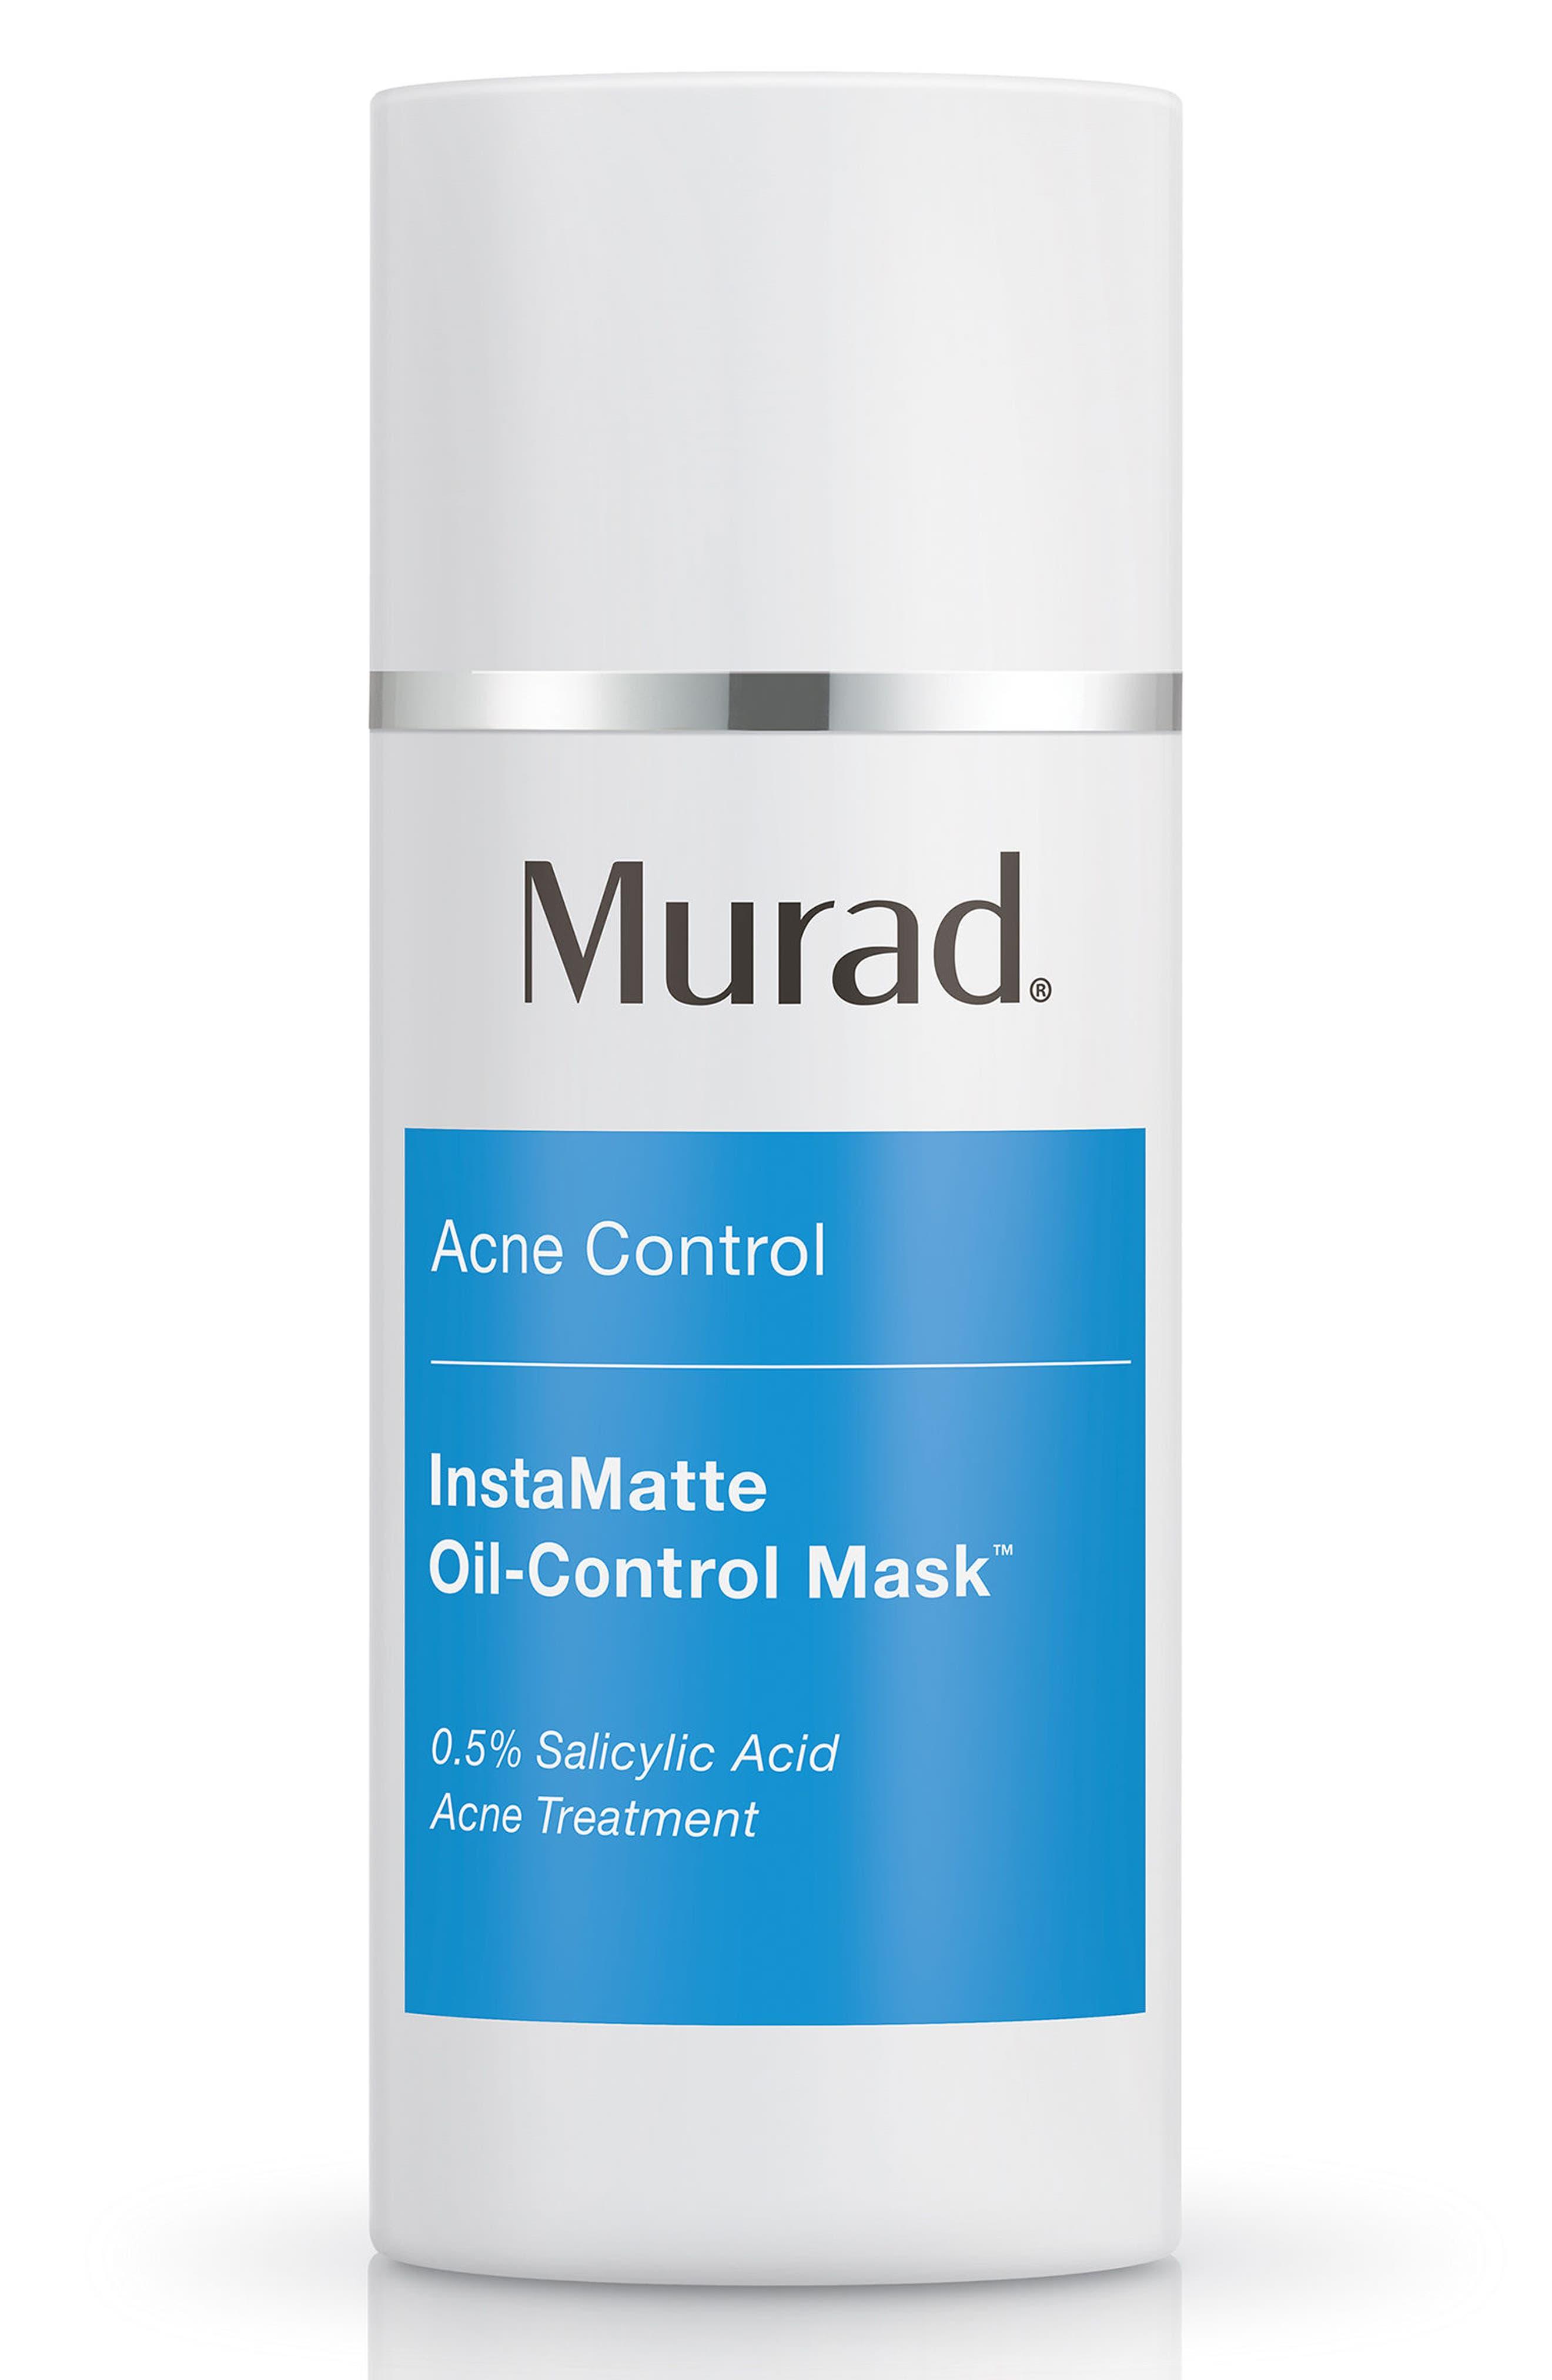 Murad® 'InstaMatte' Oil-Control Mask